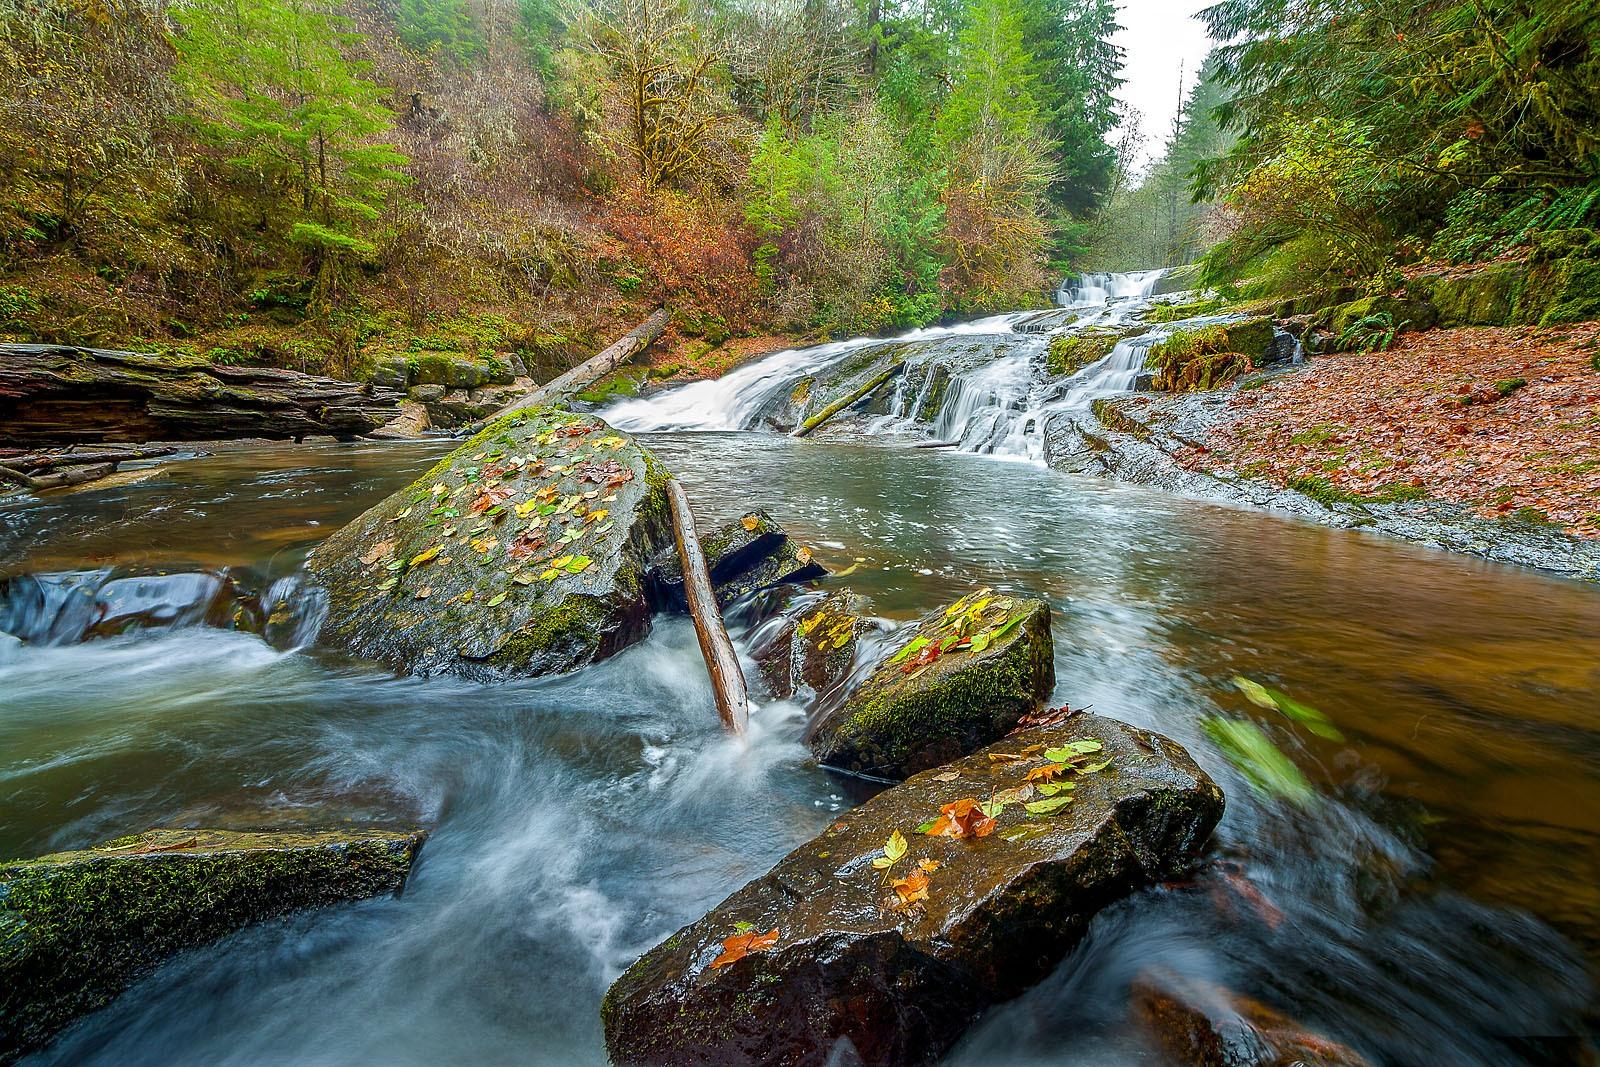 Bassett Scenic Landscape Vistas VQ4G0490_v2b_